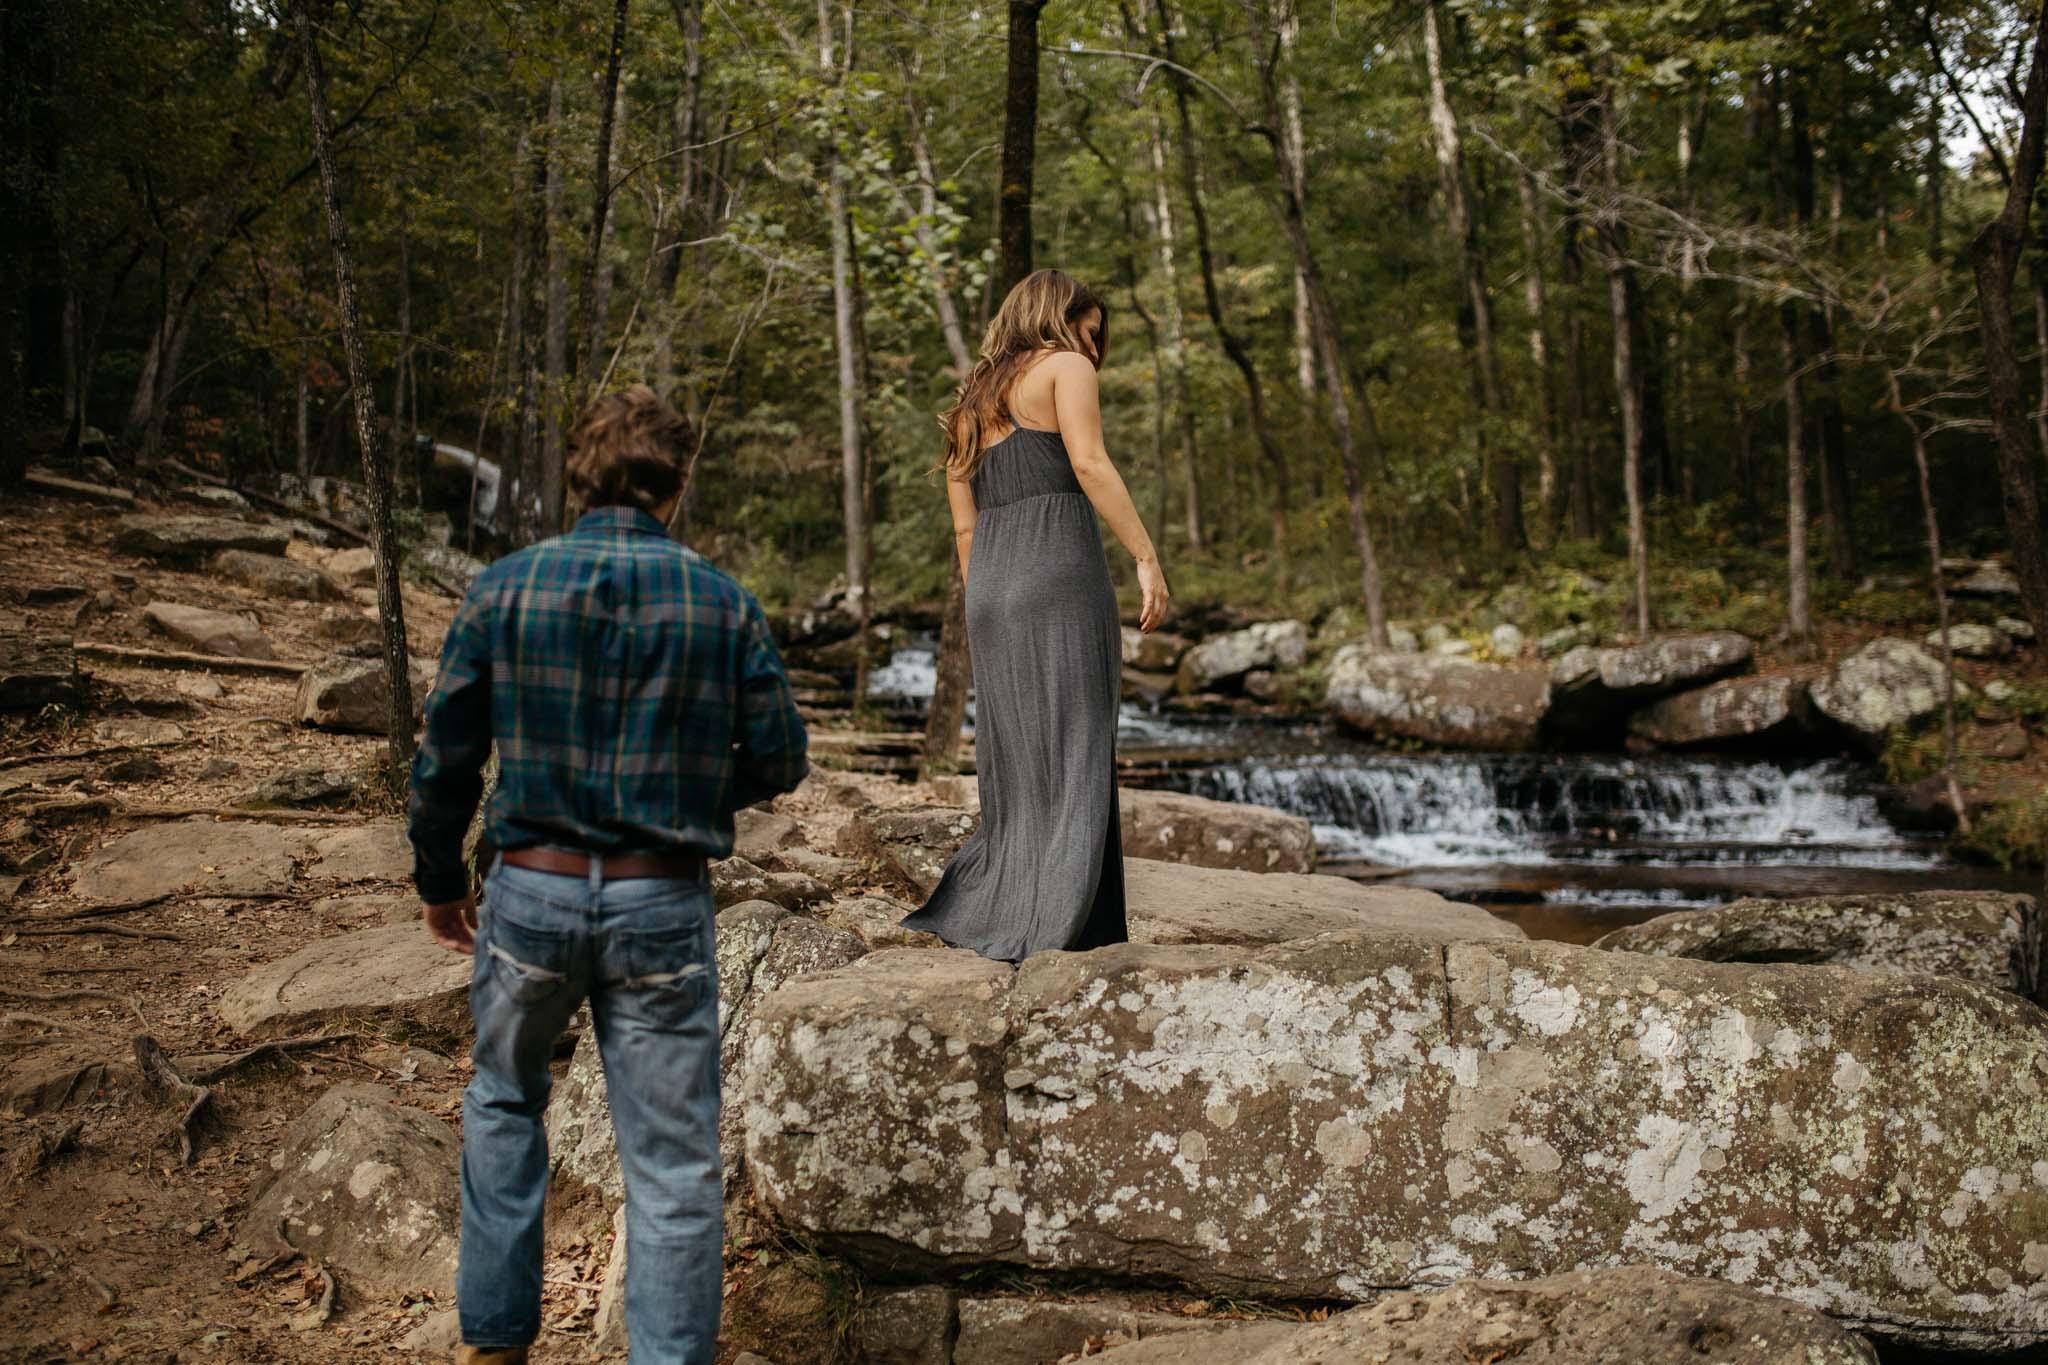 The Hatches | Hayley & Zach | Adventure Engagement Session | Heber Springs, Arkansas | Wedding + Elopement Photographers | heber-springs-arkansas-engagement-wedding-elopement-waterfalls-mountains-adventurous-couple-unique-intimate-lifestyle-nature-woodland-romance-utah-colorado-arizona-washington-memphis-tennessee-wedding-photographers